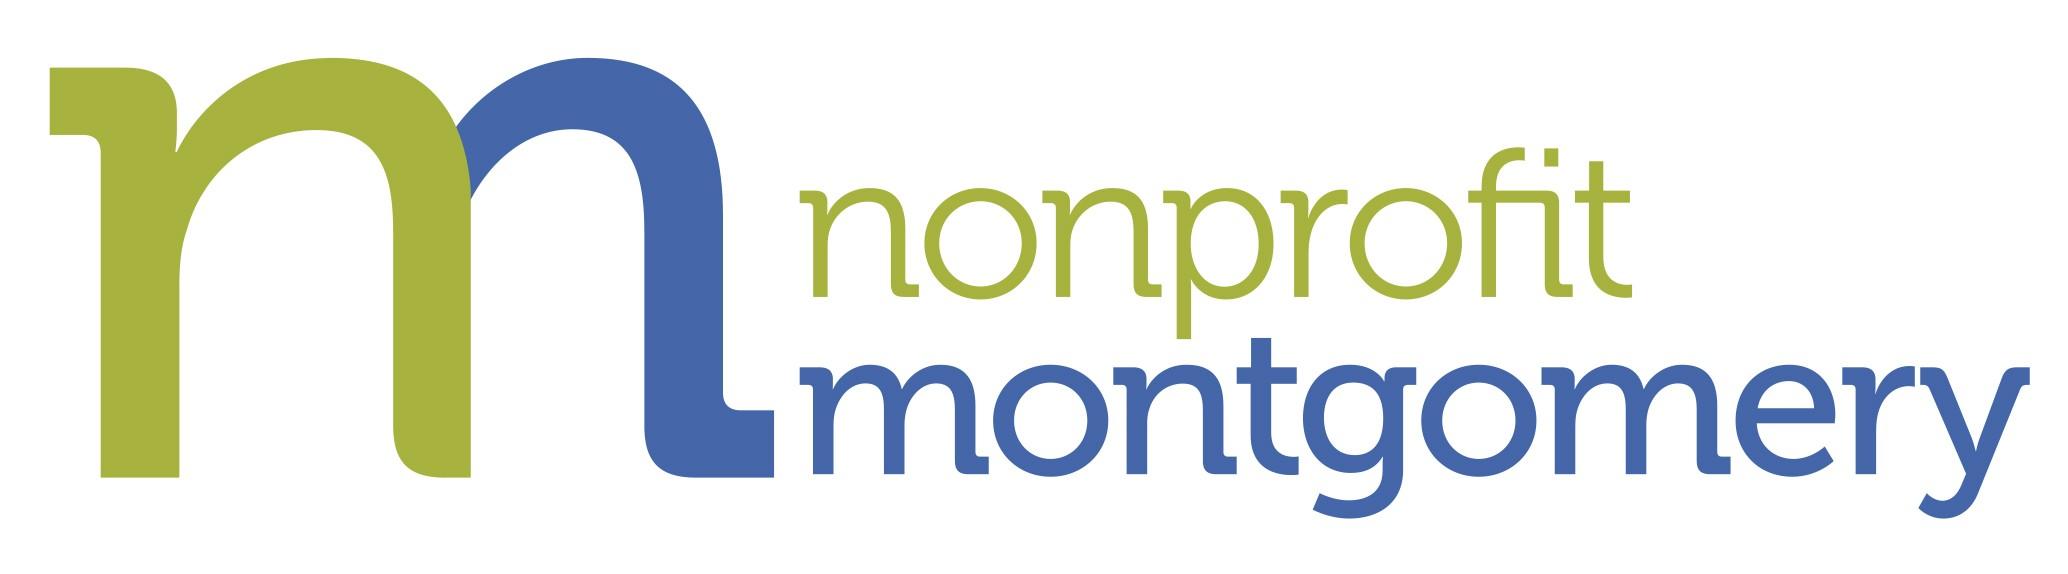 Nonprofit Montgomery | LinkedIn